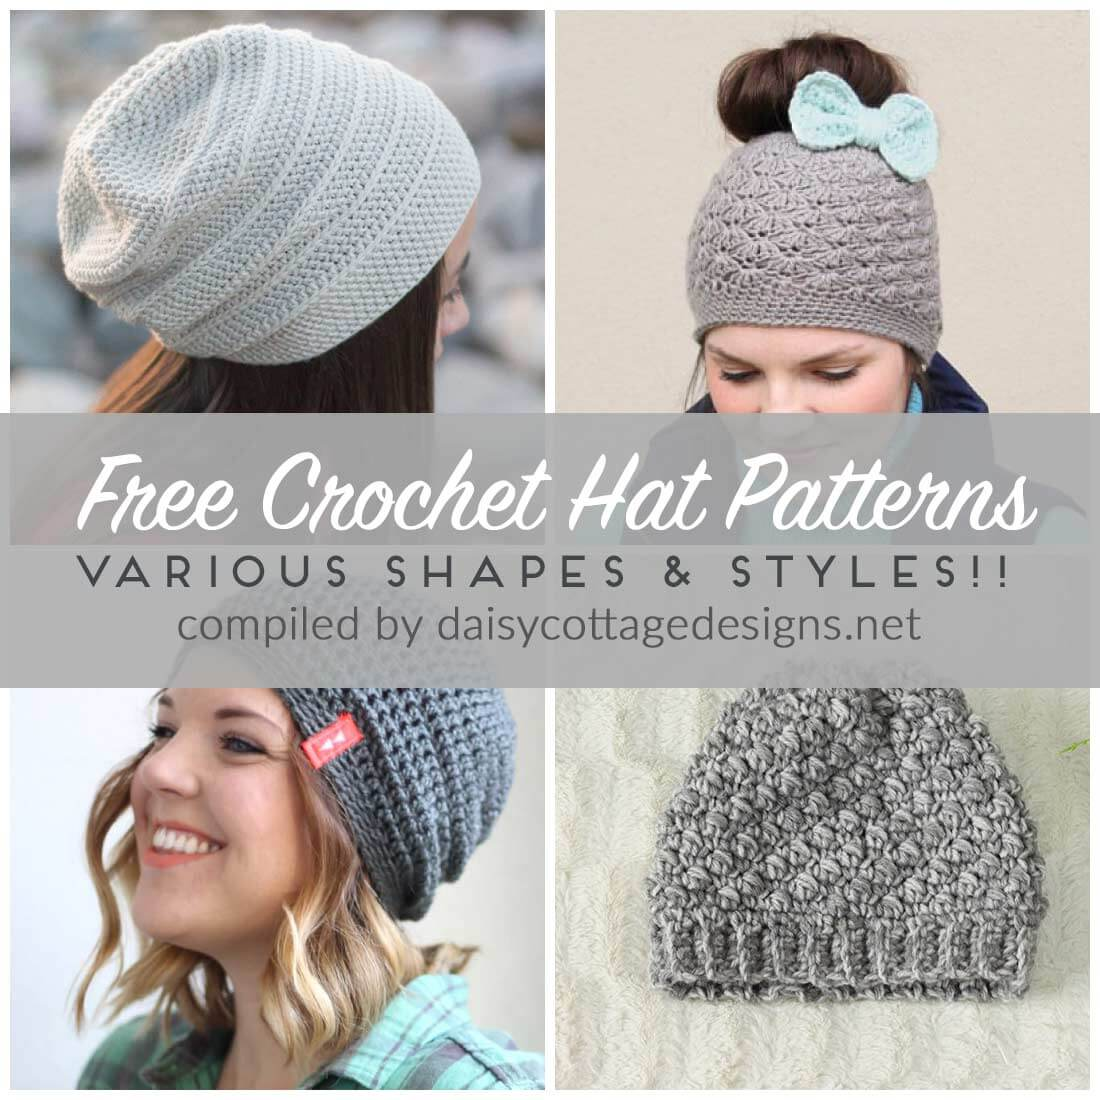 free crochet hat patterns | free crochet patterns | crochet patterns | use zdaiwsu